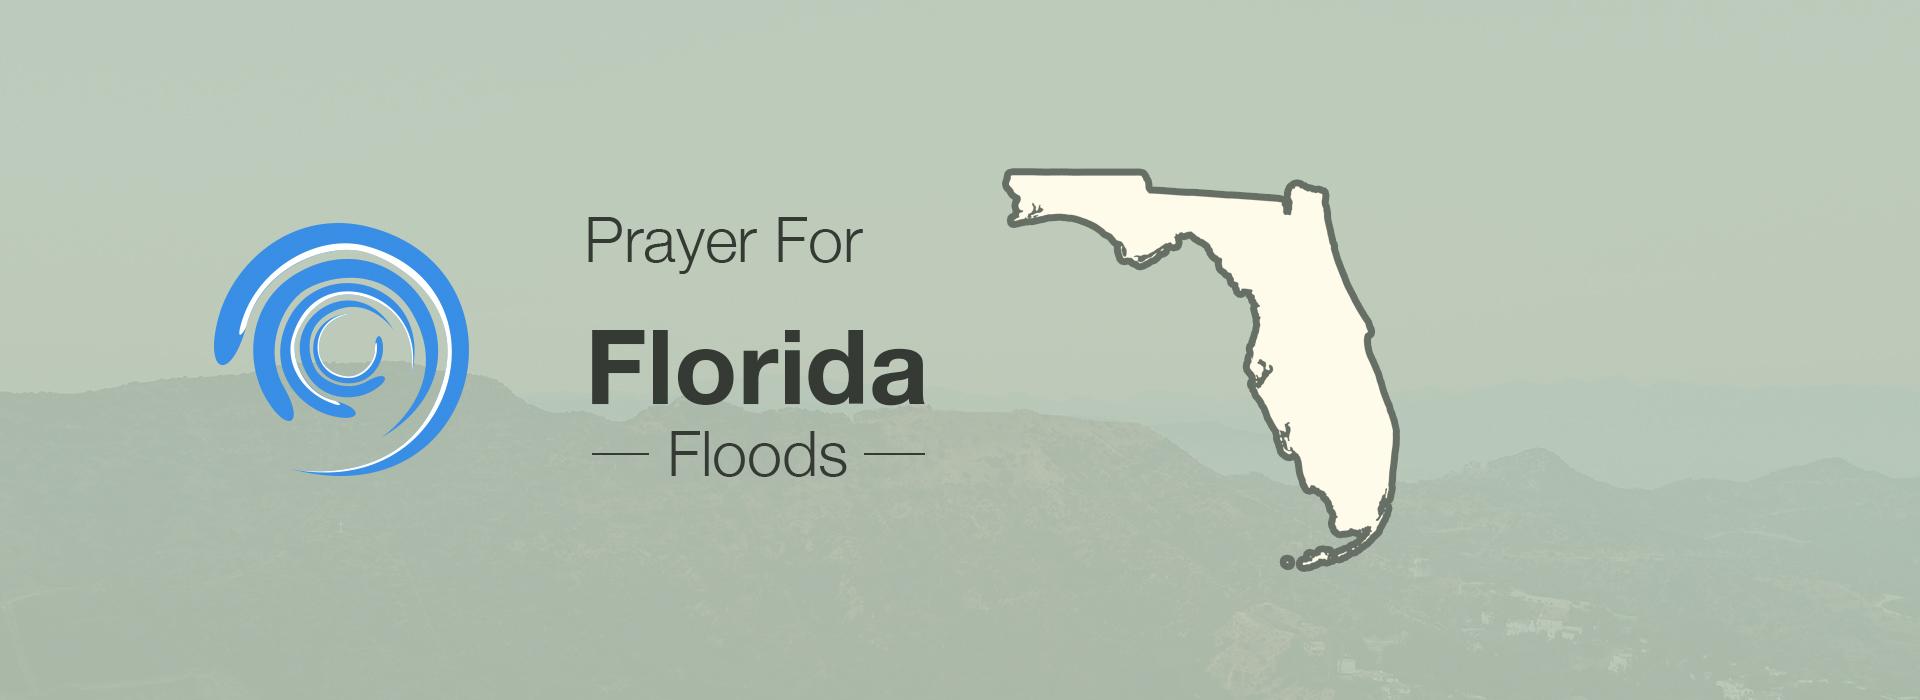 FastingPrayerDay_Florida.jpg